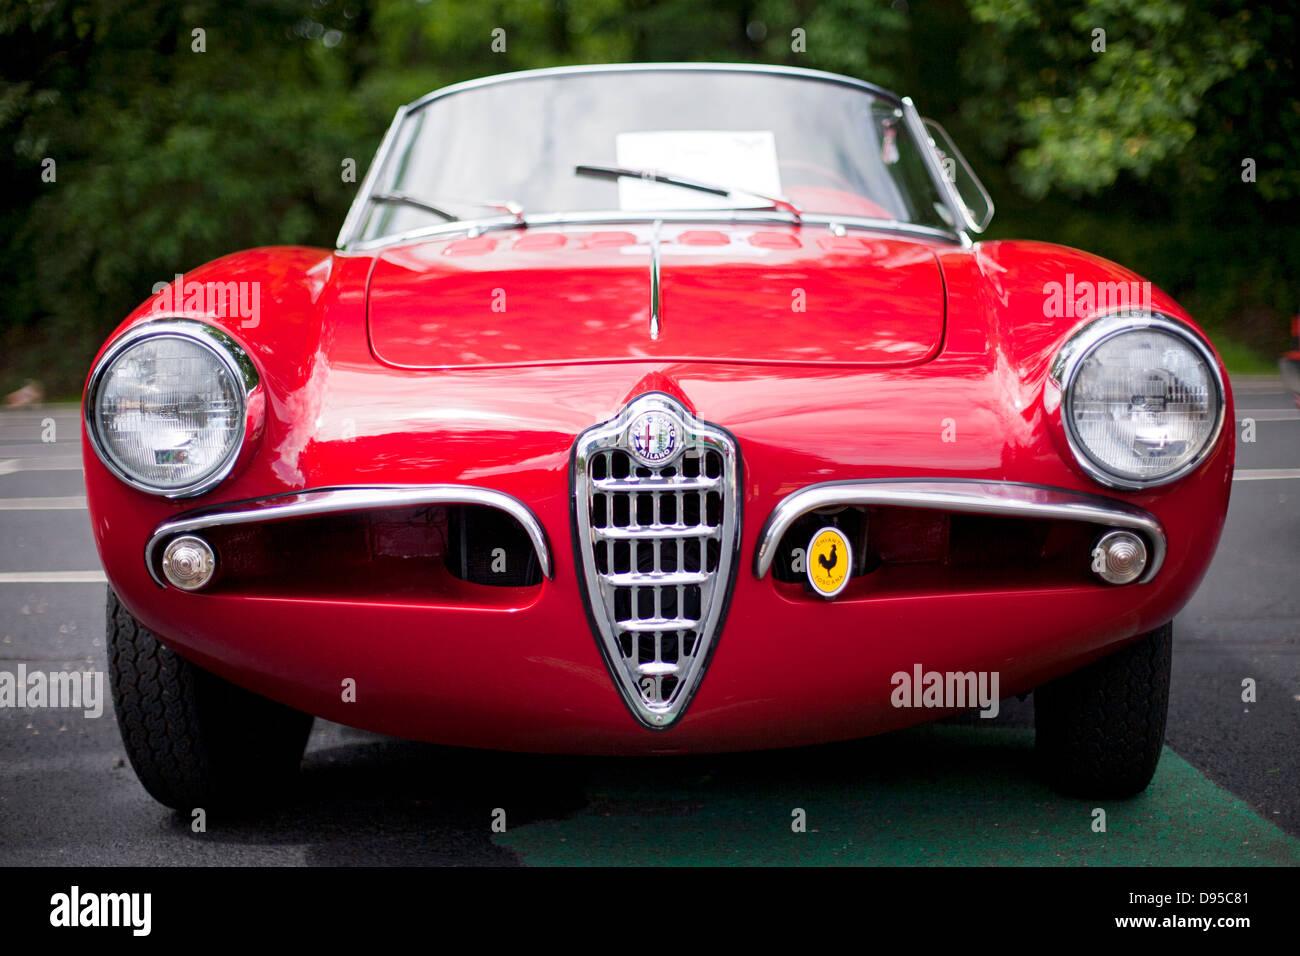 Vintage Alfa Romeo >> Vintage Alfa Romeo Stock Photo 57282401 Alamy